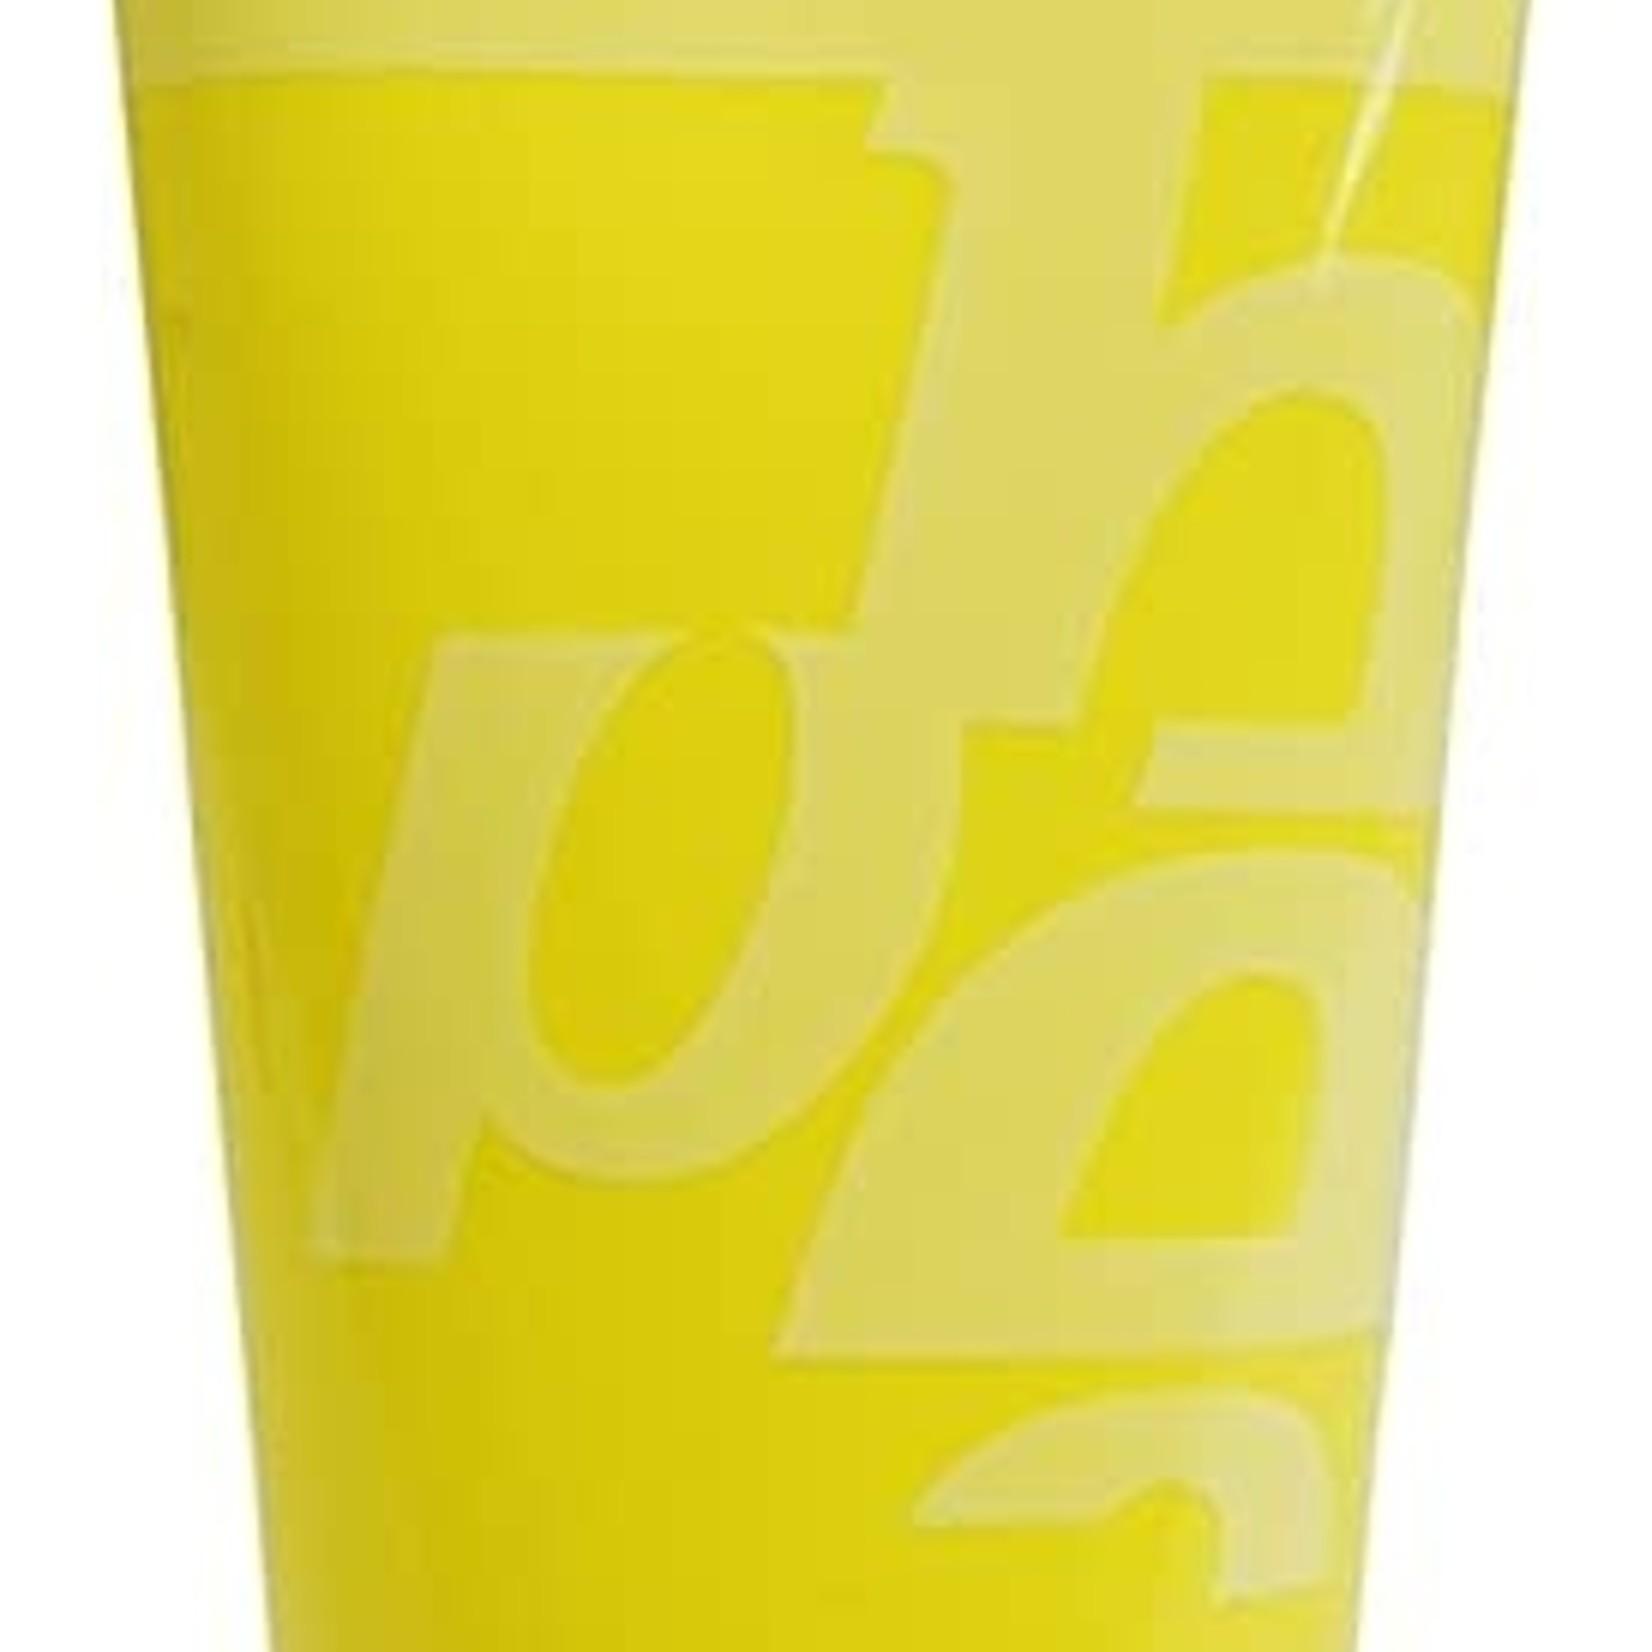 Pebeo Pebeo Acrylic Primary Yellow Opaque